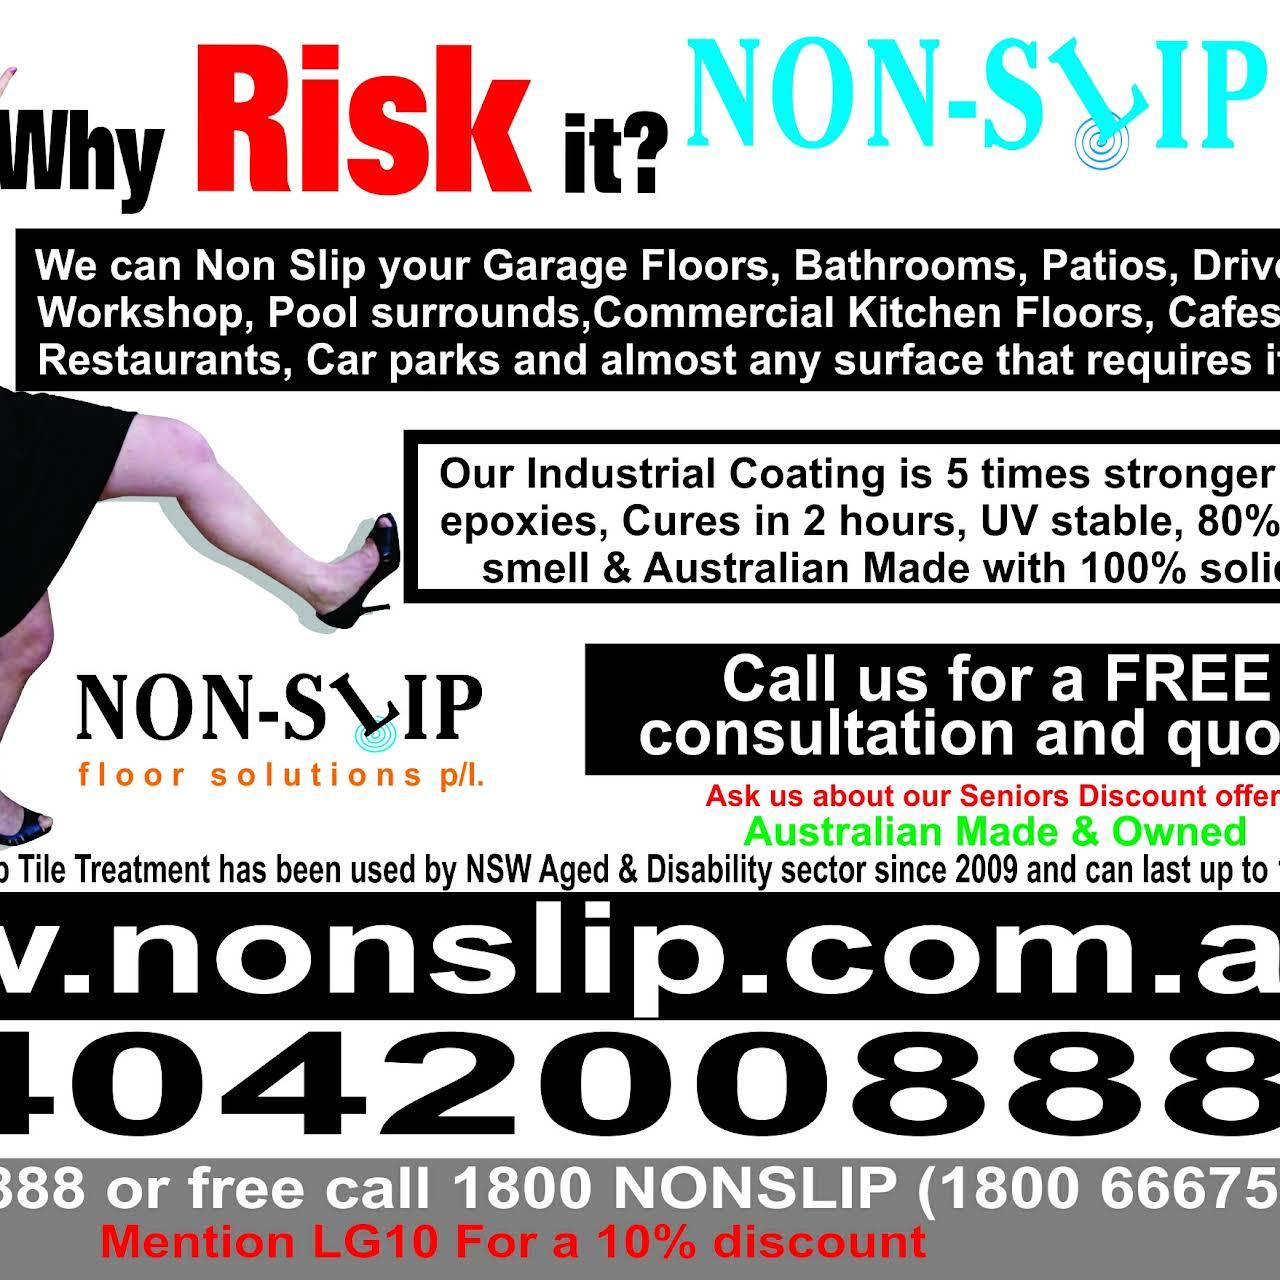 Non Slip Floor Solutions   Anti Slip Tiles, Epoxy Coating, Cleaning